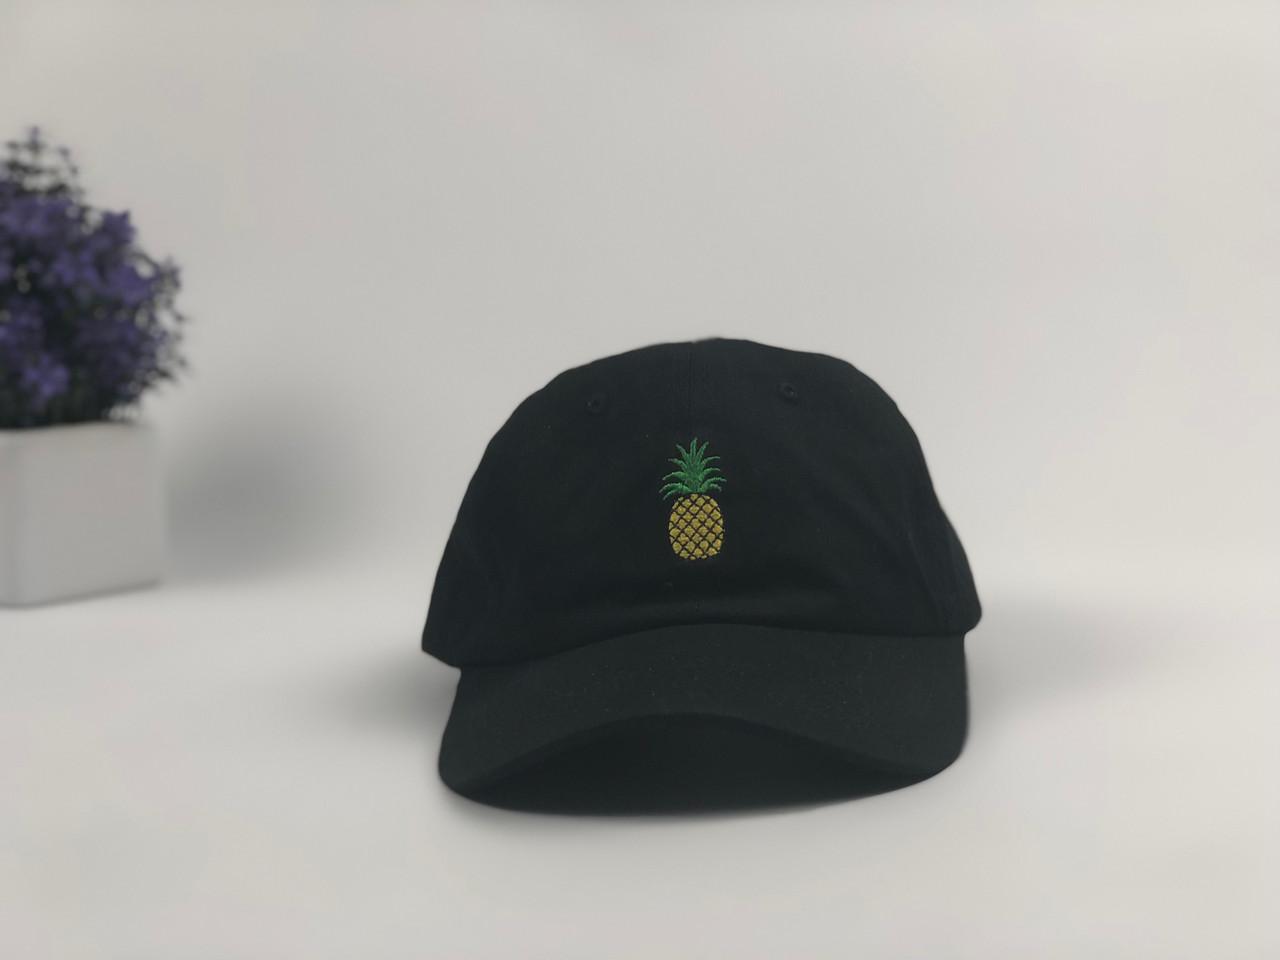 Кепка бейсболка Ананас (черная)